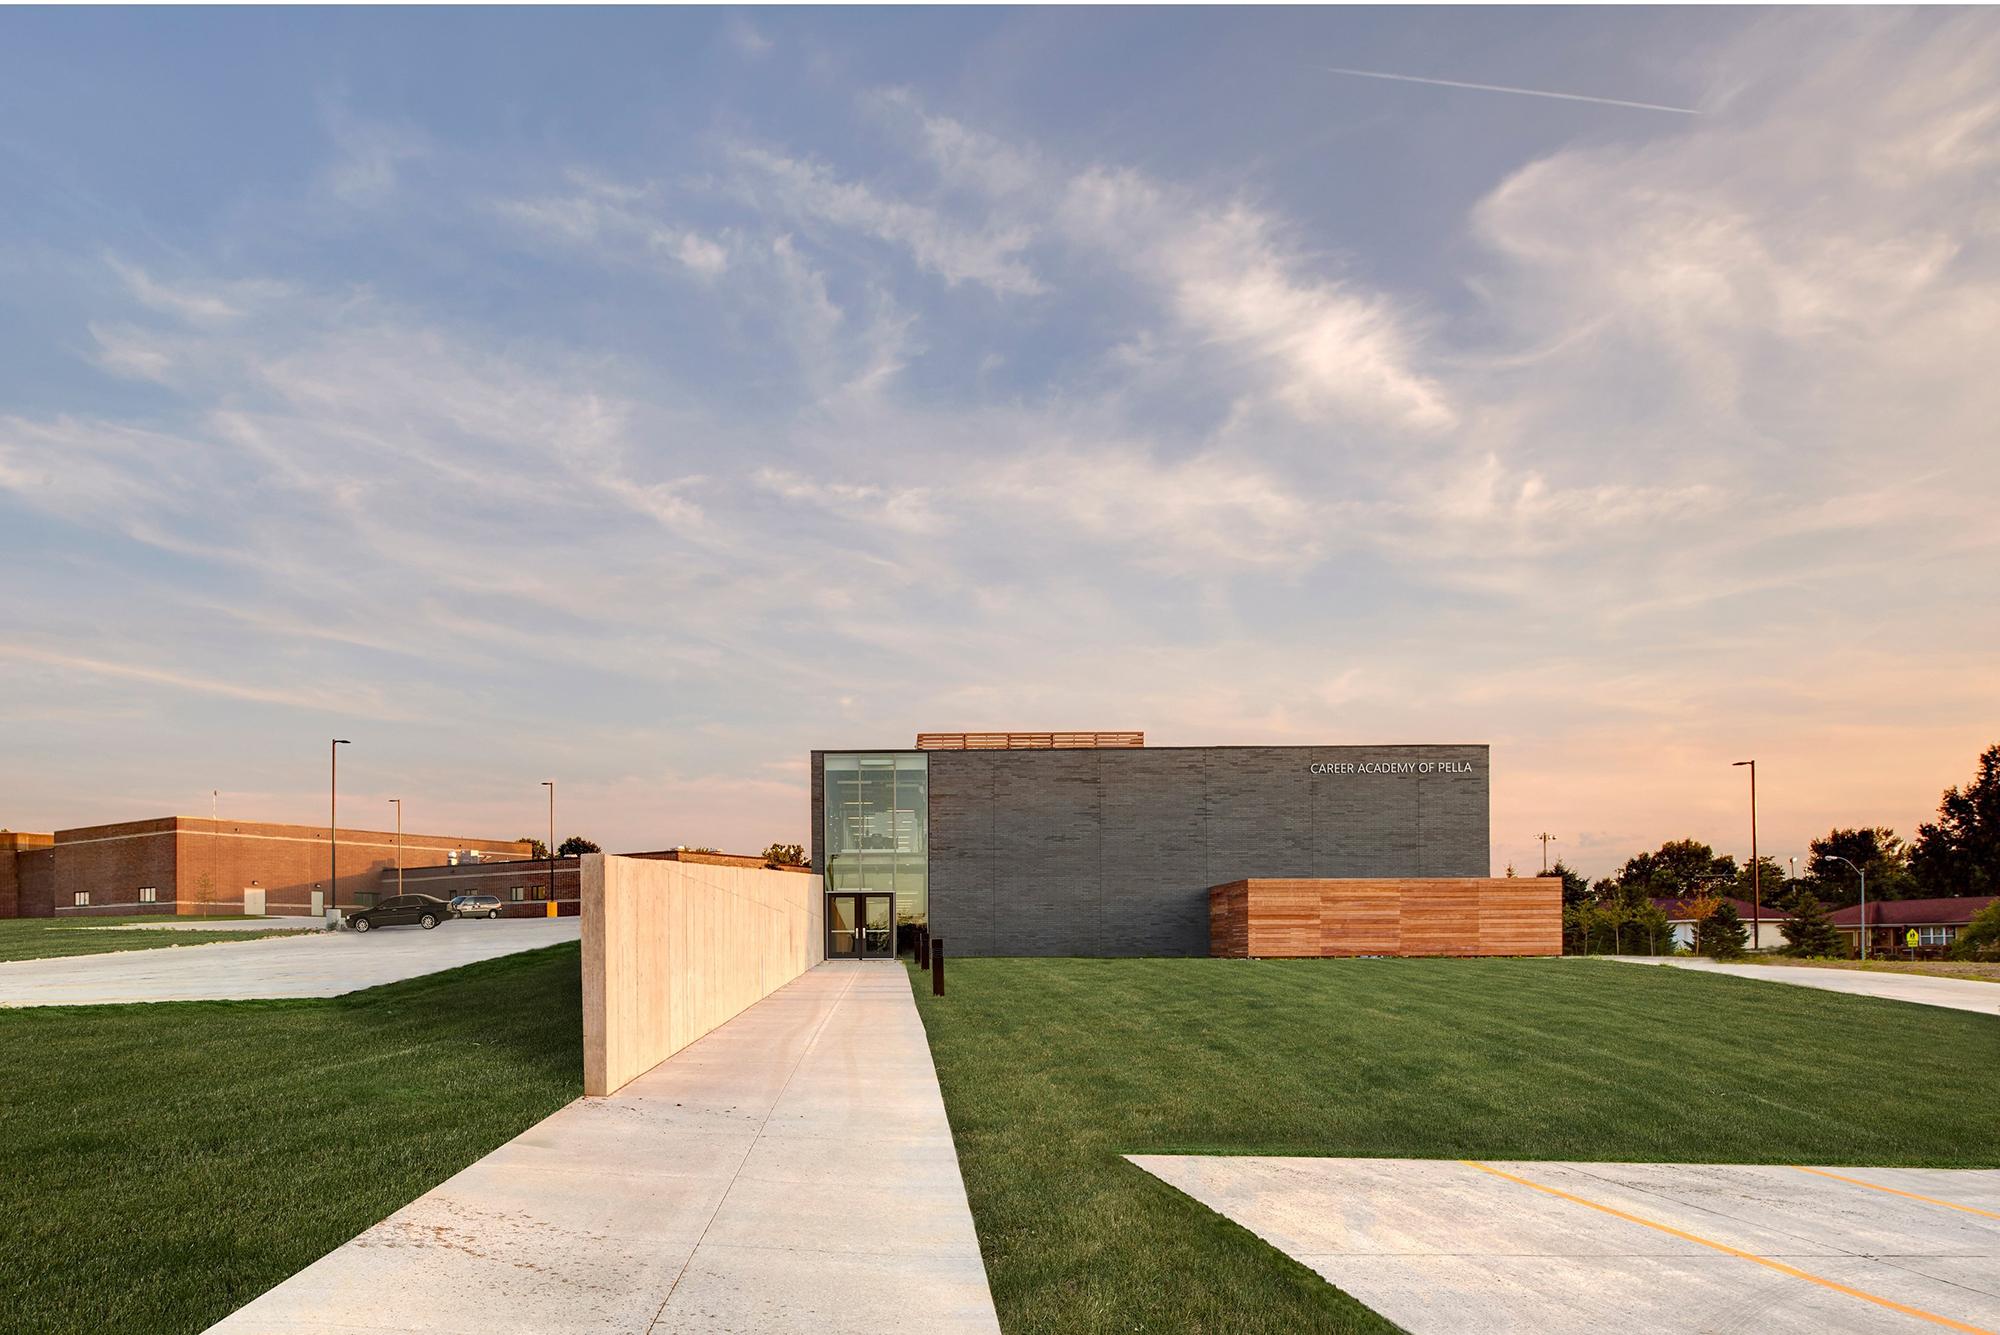 Aia Iowa Announces 2015 Excellence In Design Award Winners Architect Magazine Awards Award Winners Aia Iowa Iowa